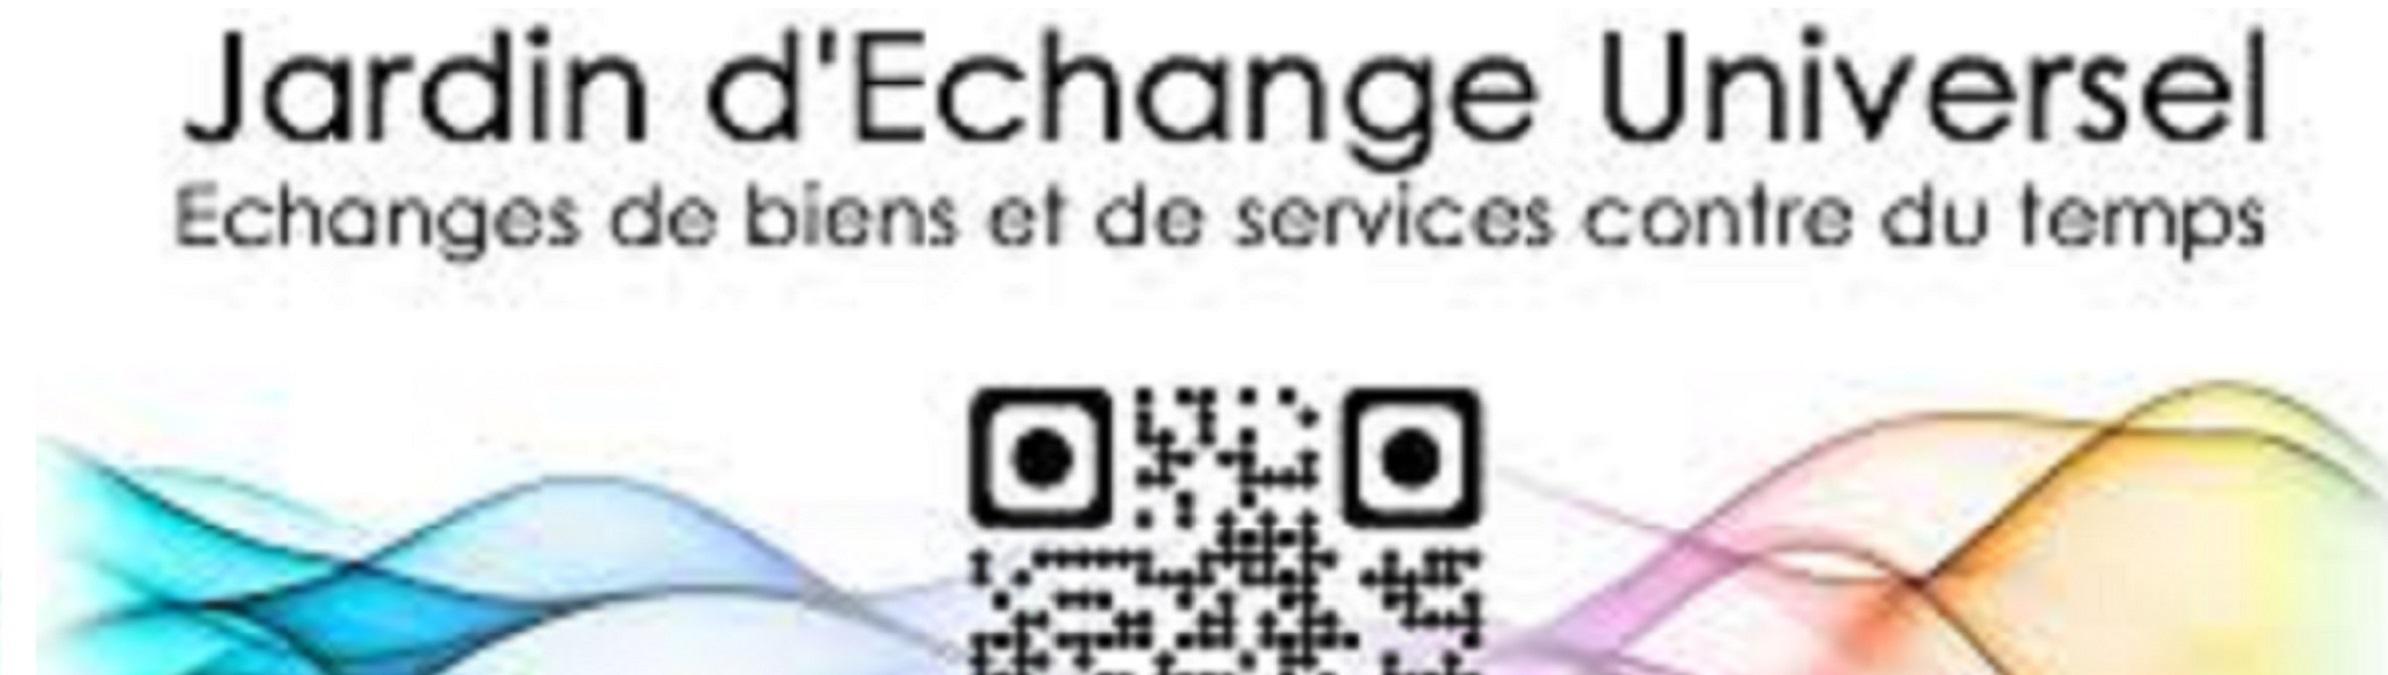 JEU: Jardin d'Echange Universel